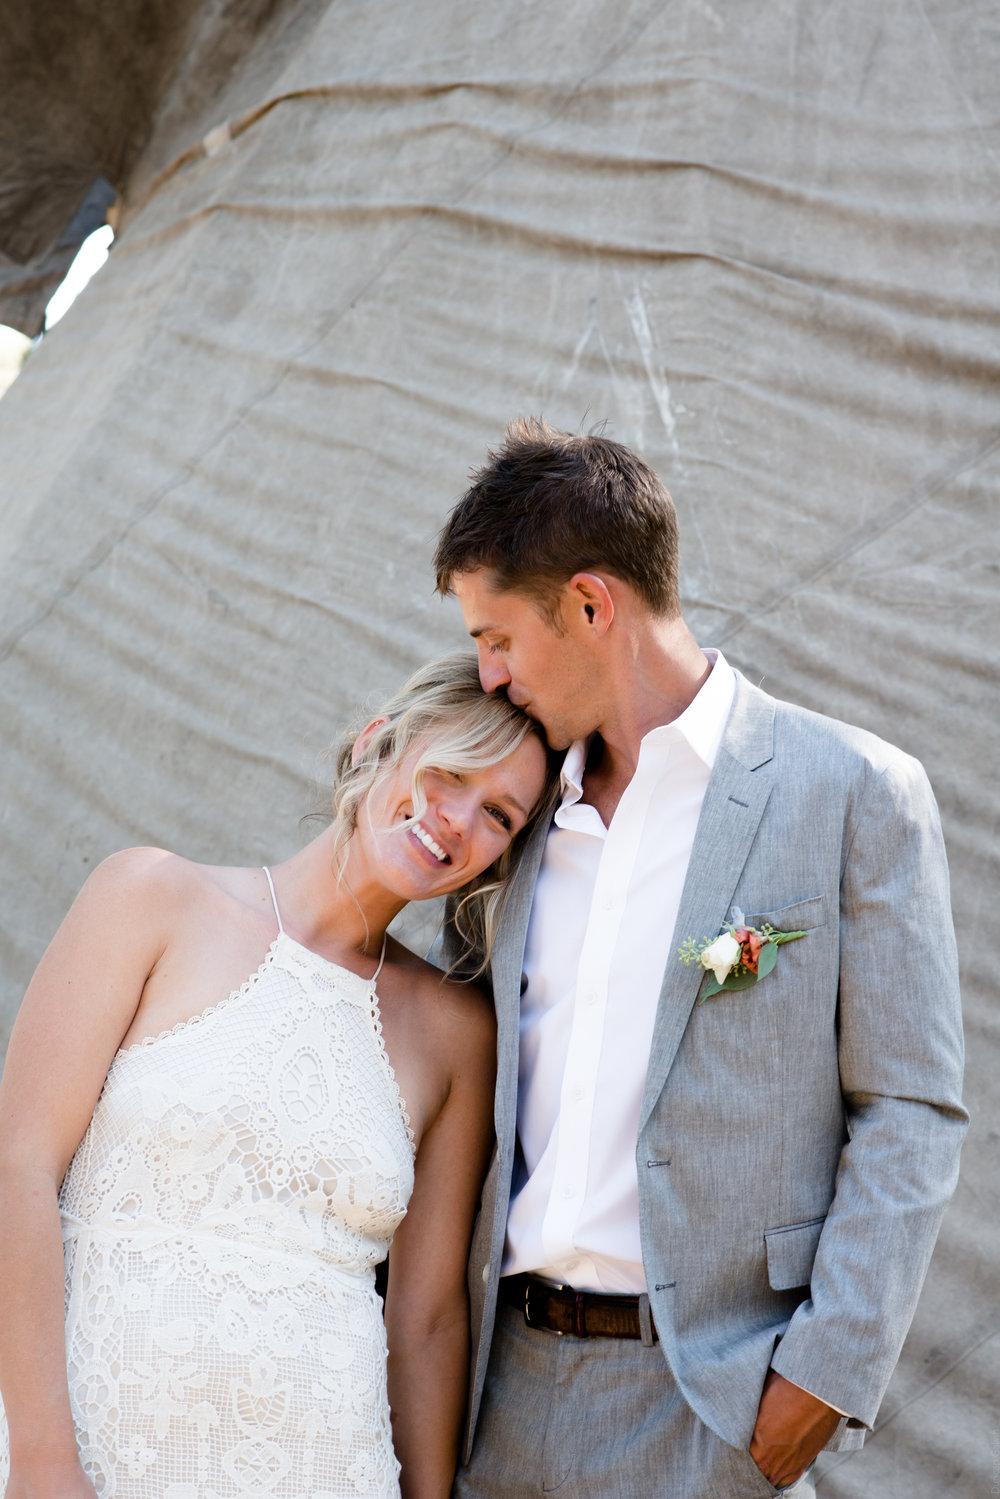 Lana Micah Wedding La Grande Oregon September 2018 Please Credit Talia Jean Galvin (288 of 687).jpg